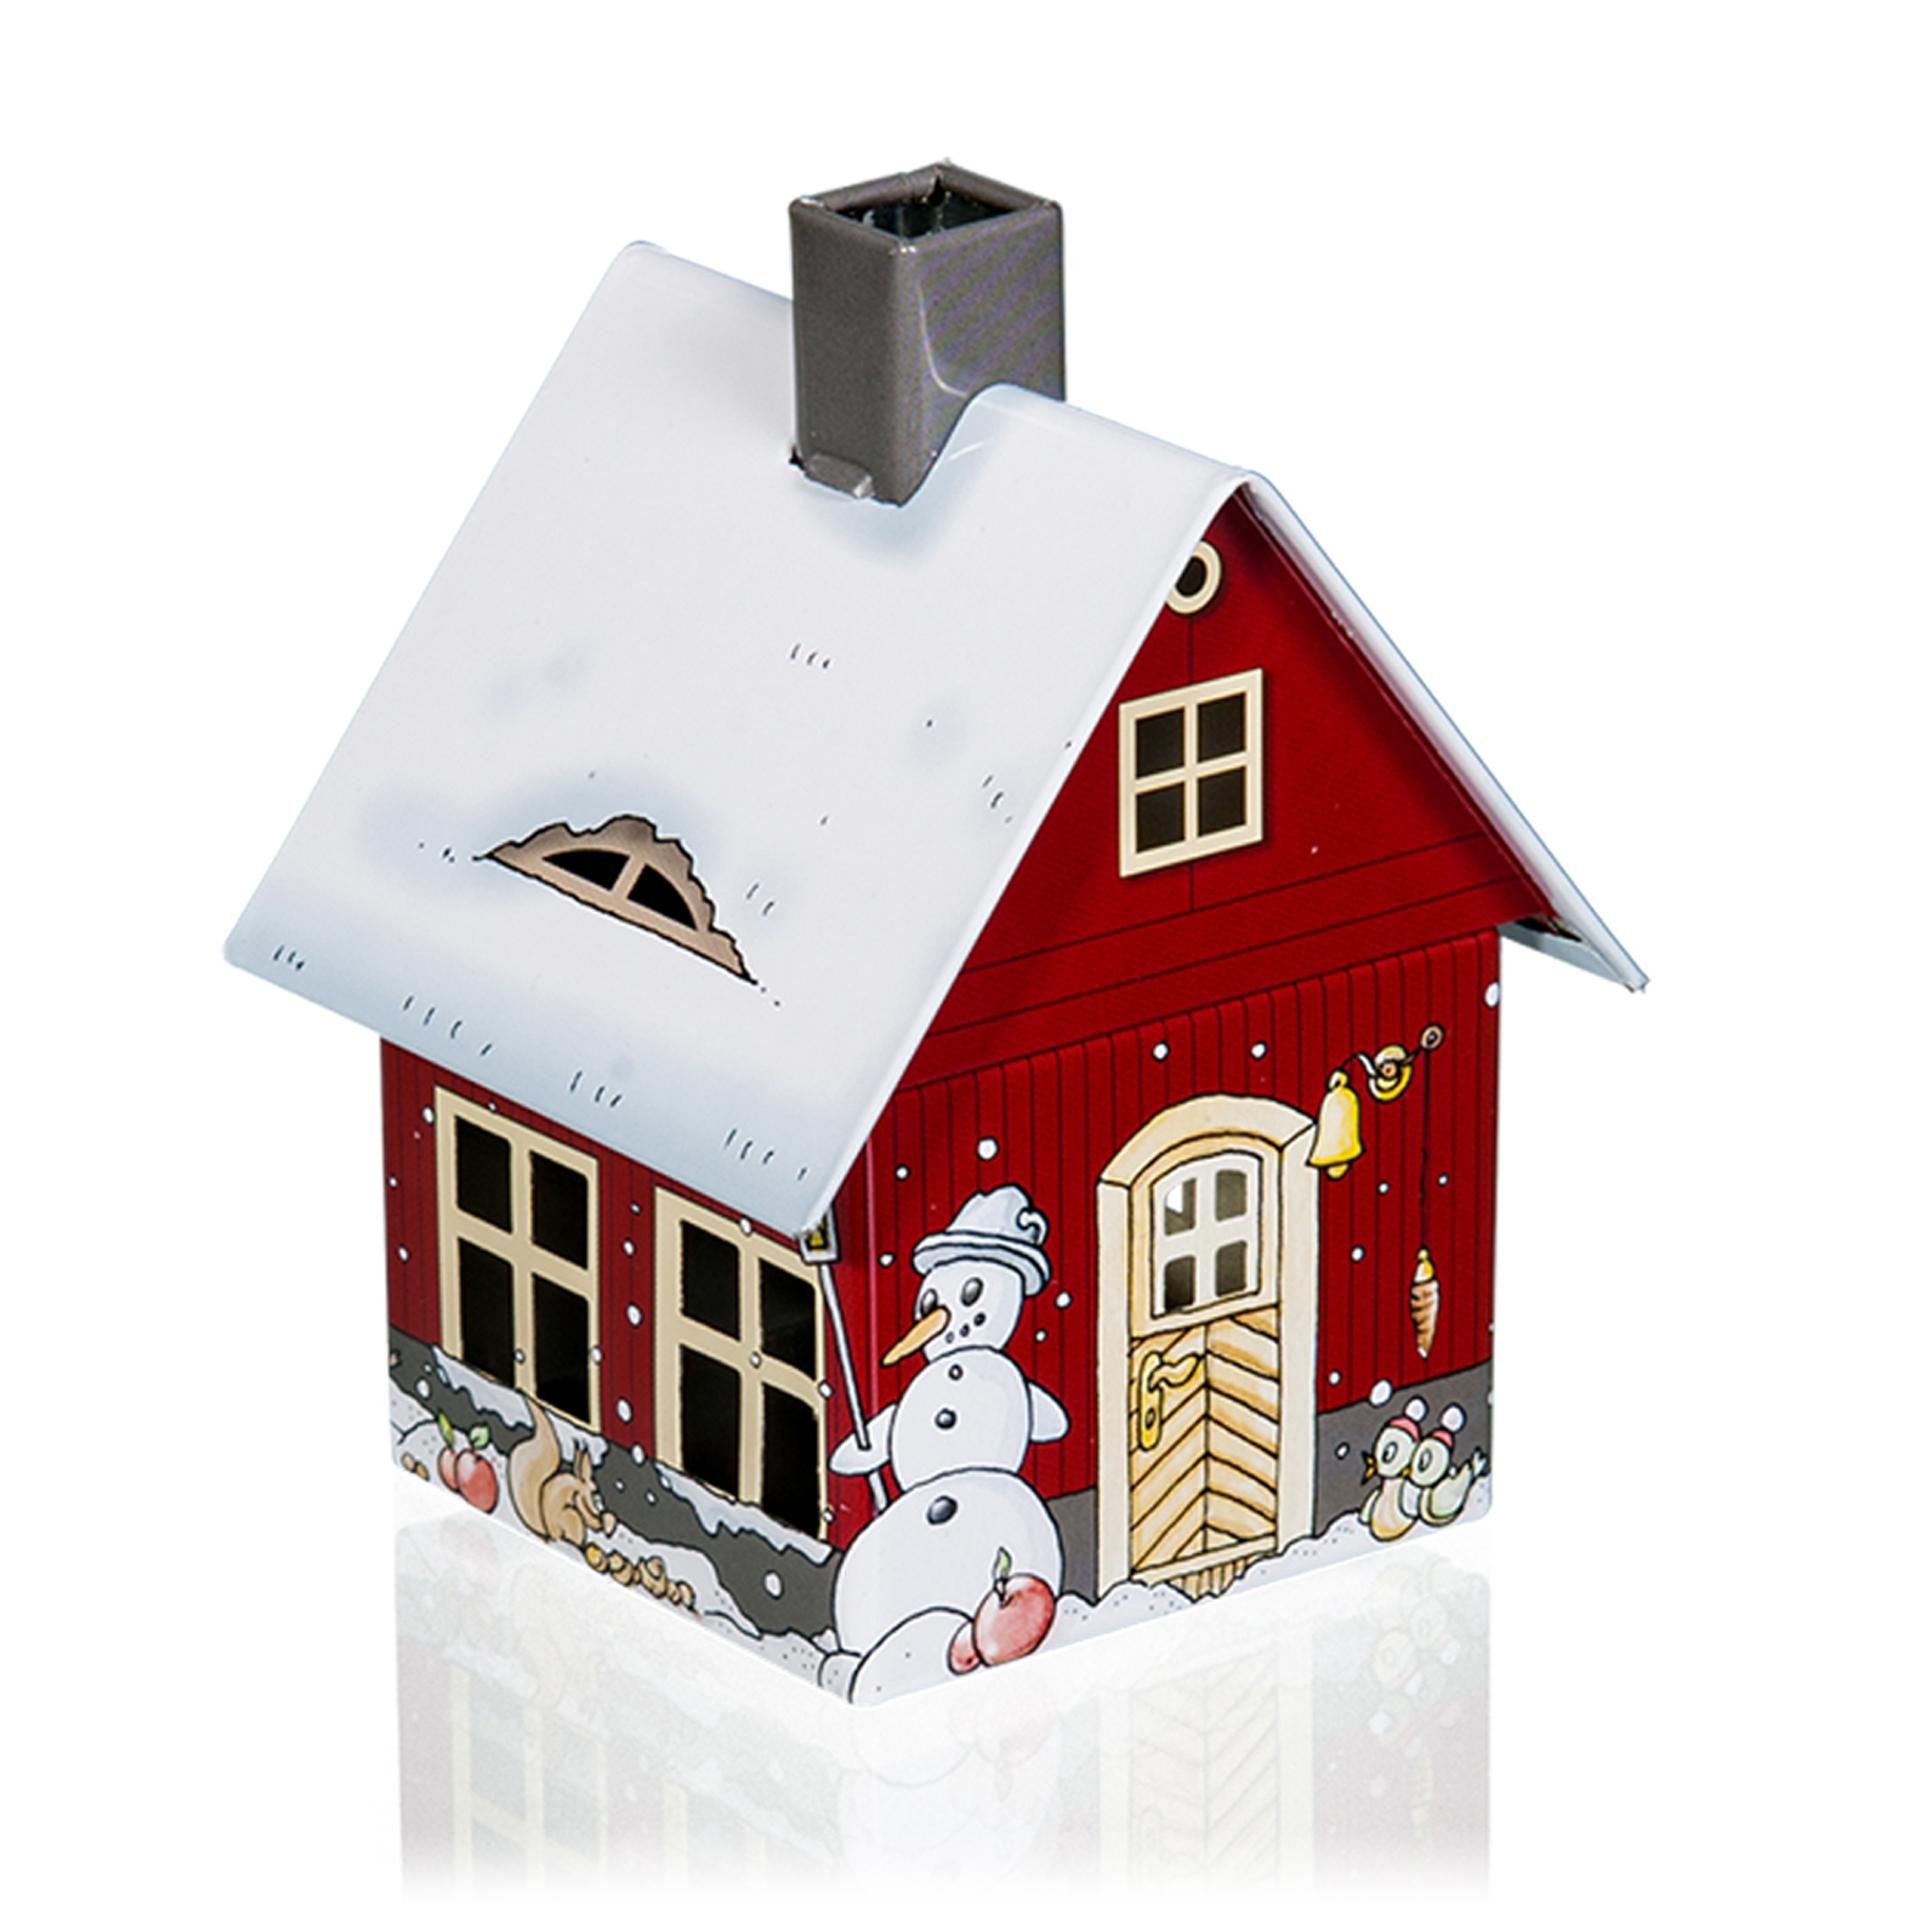 Rauchhaus Metall Wintermotiv